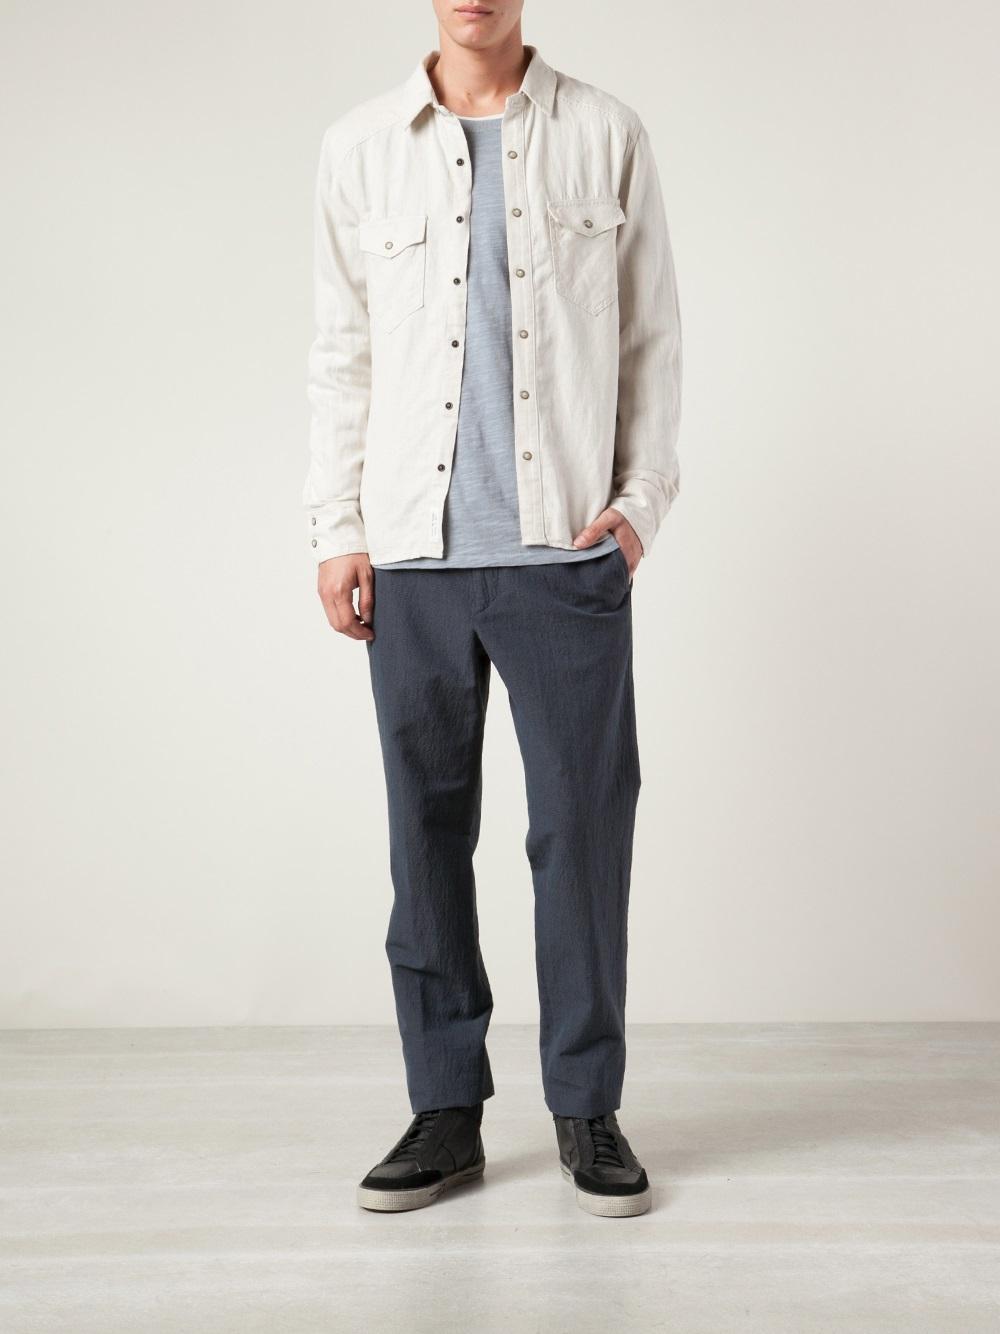 1f448192 Rag & Bone Western Shirt in Natural for Men - Lyst